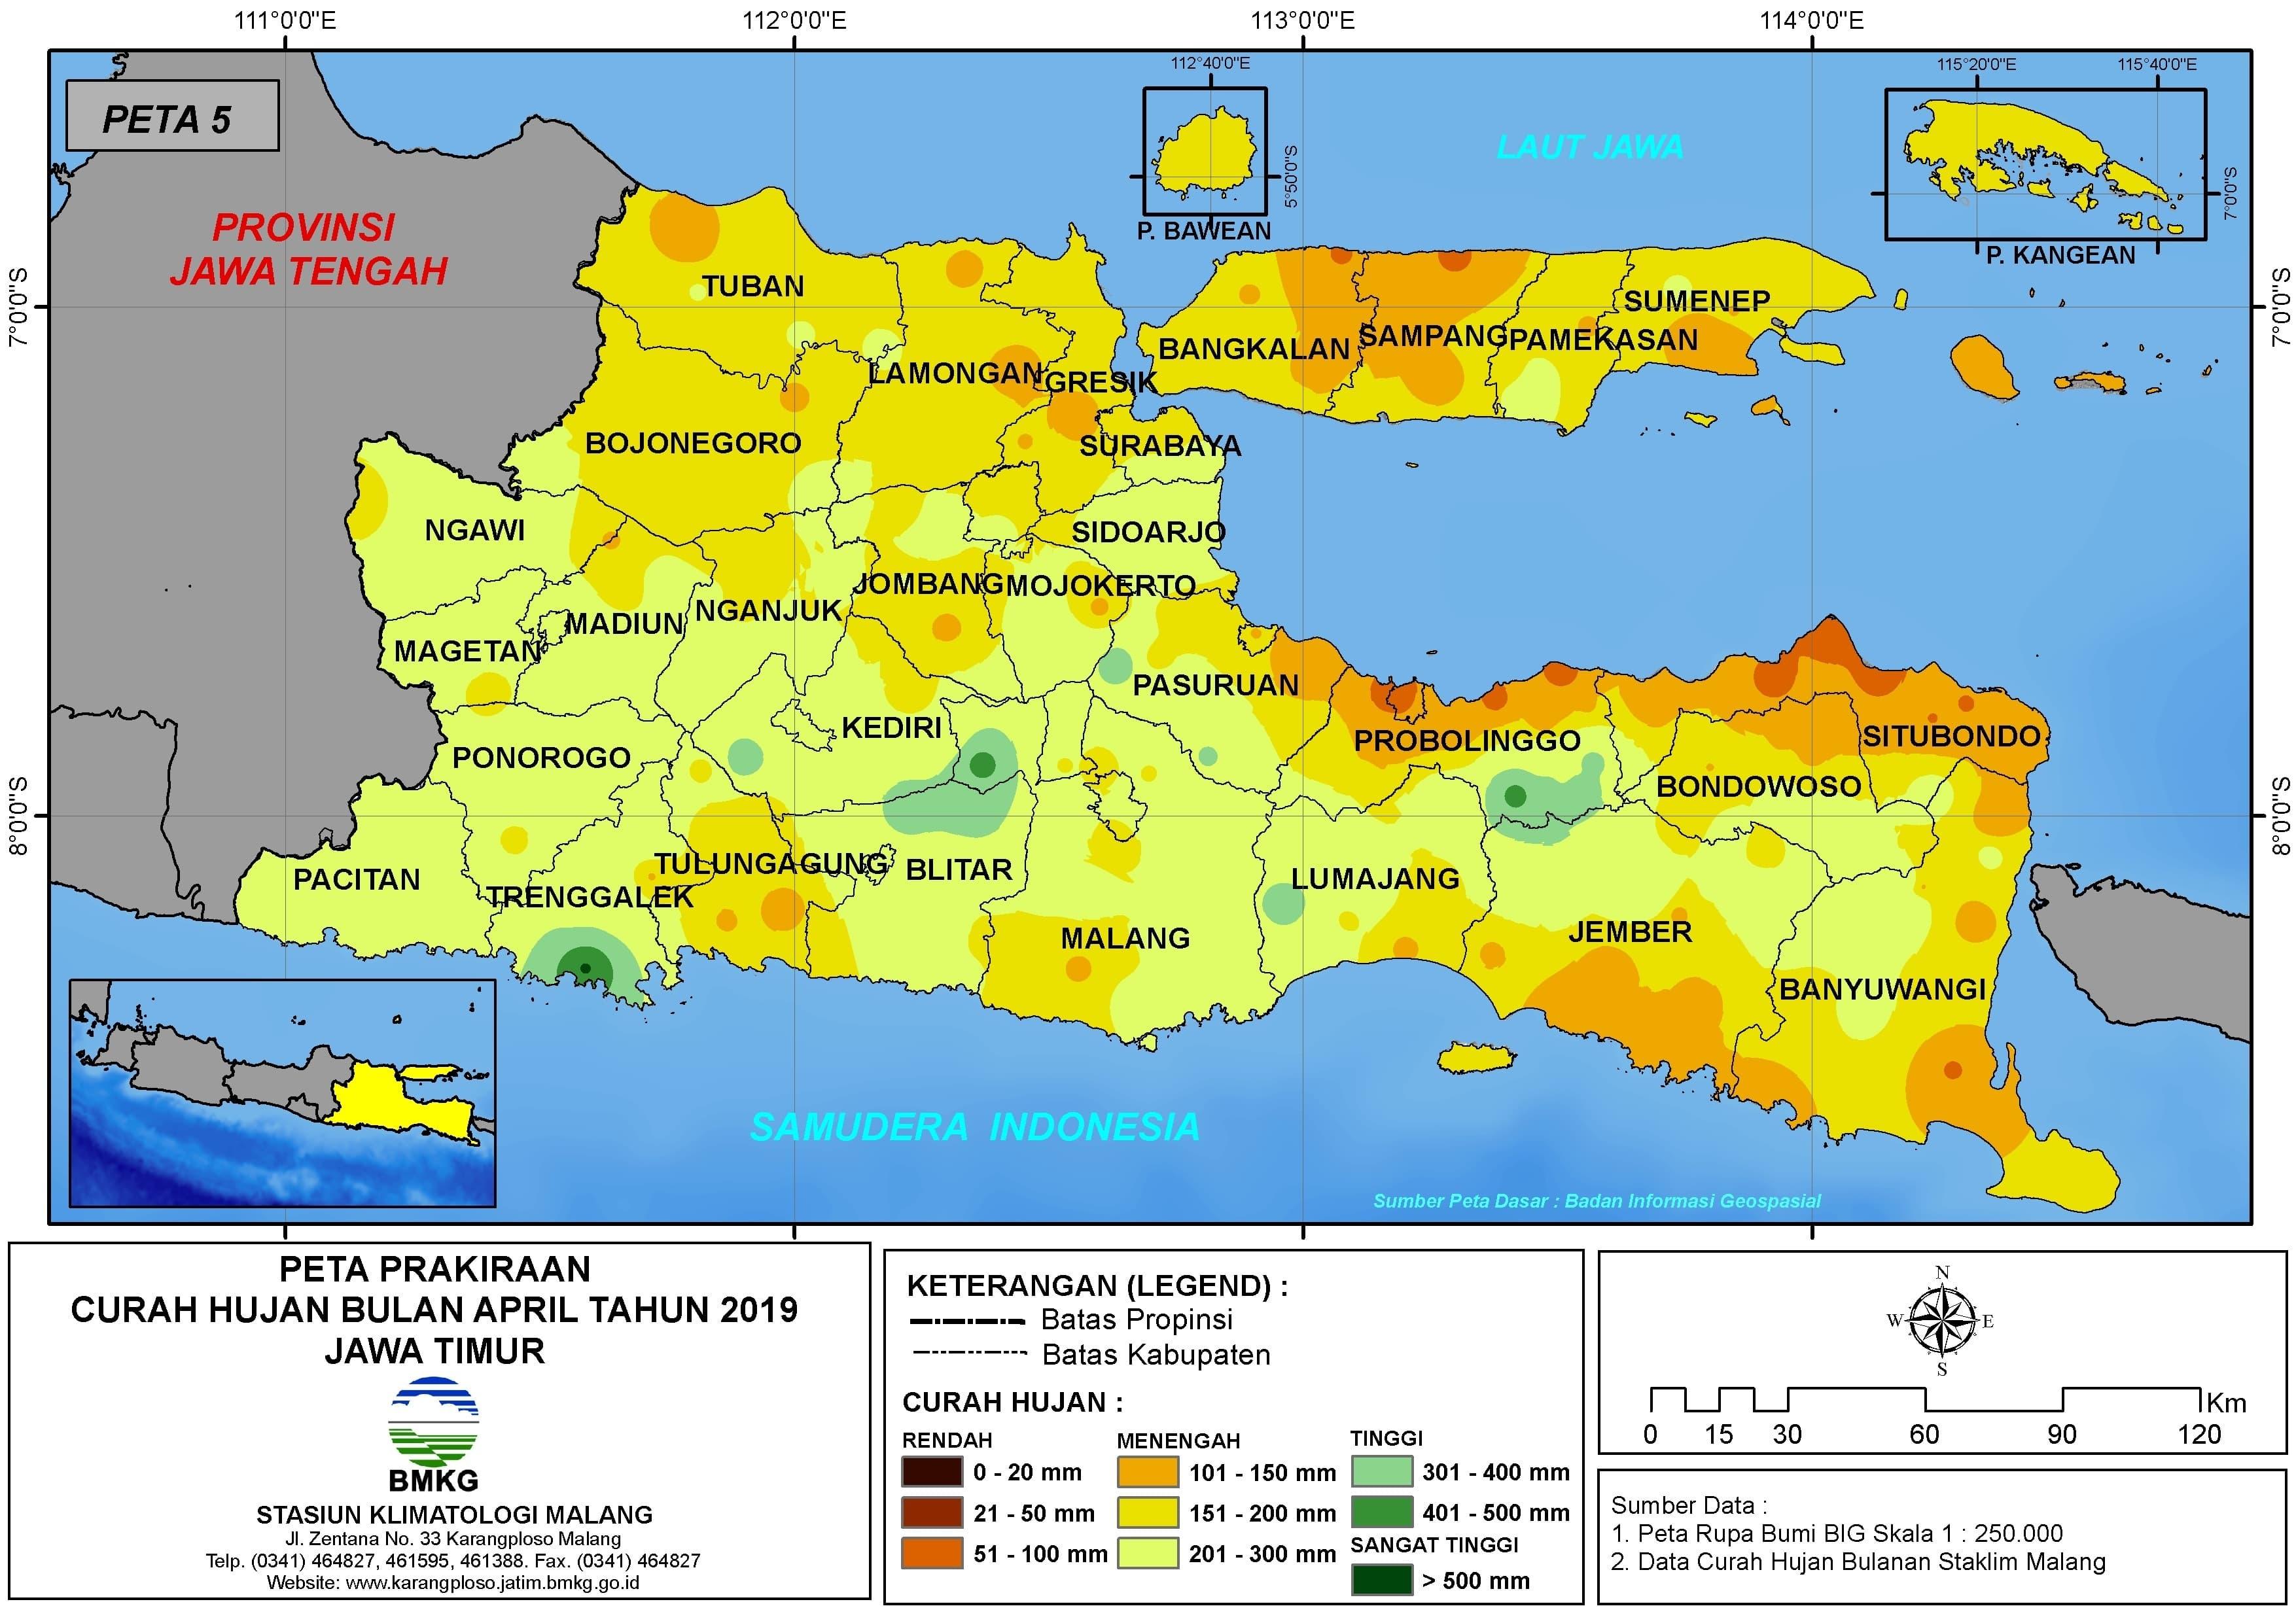 Prakiraan Curah Hujan Bulan April Tahun 2019 di Provinsi Jawa Timur Update dari Analisis Bulan Februari 2019